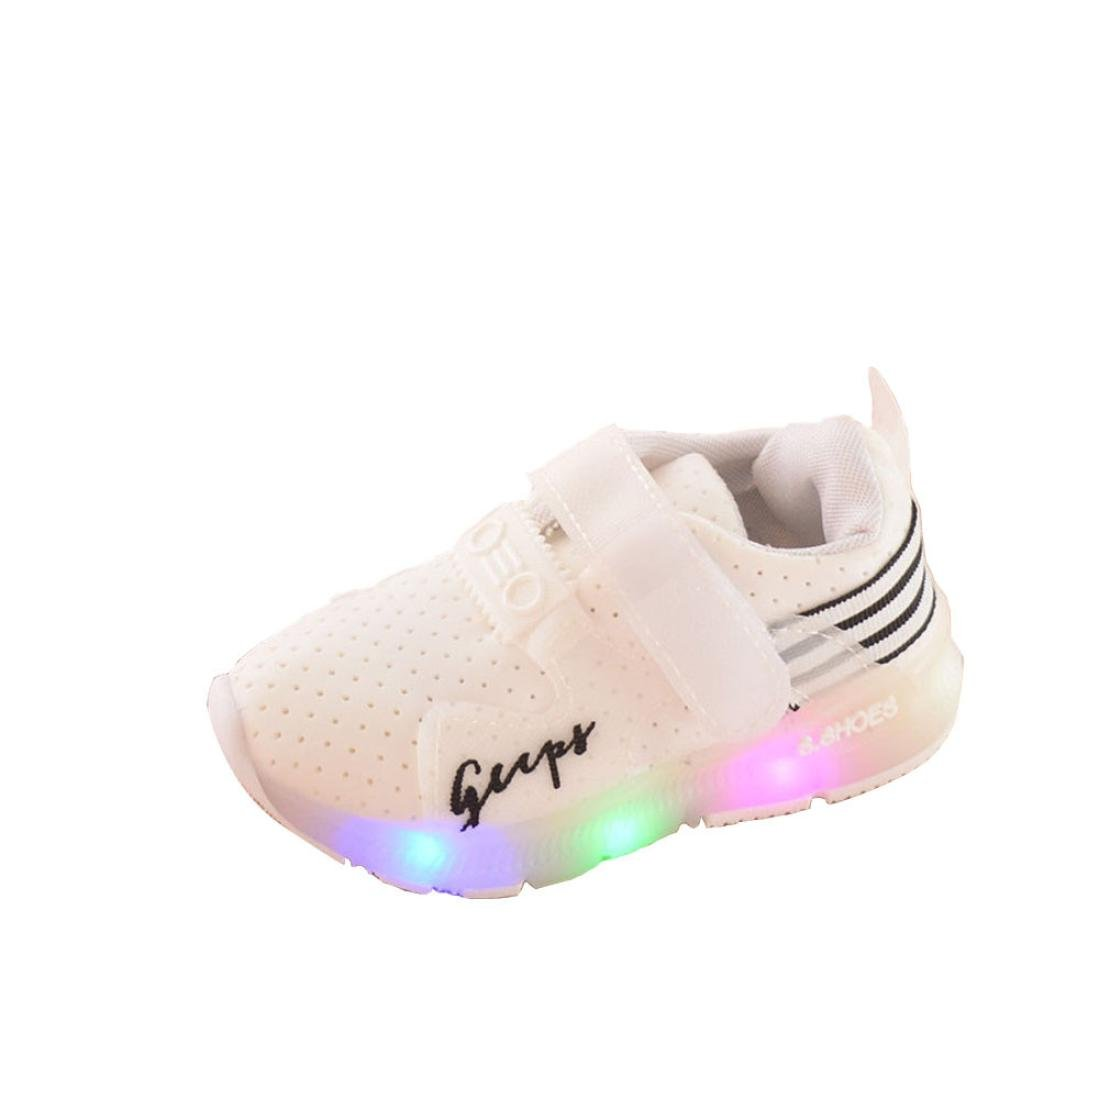 Herbst Kind SportSchuhe QinMM Baby Kleinkind Schuhe Jungen M/äDchen Sport Running LED Leuchtende Schuhe